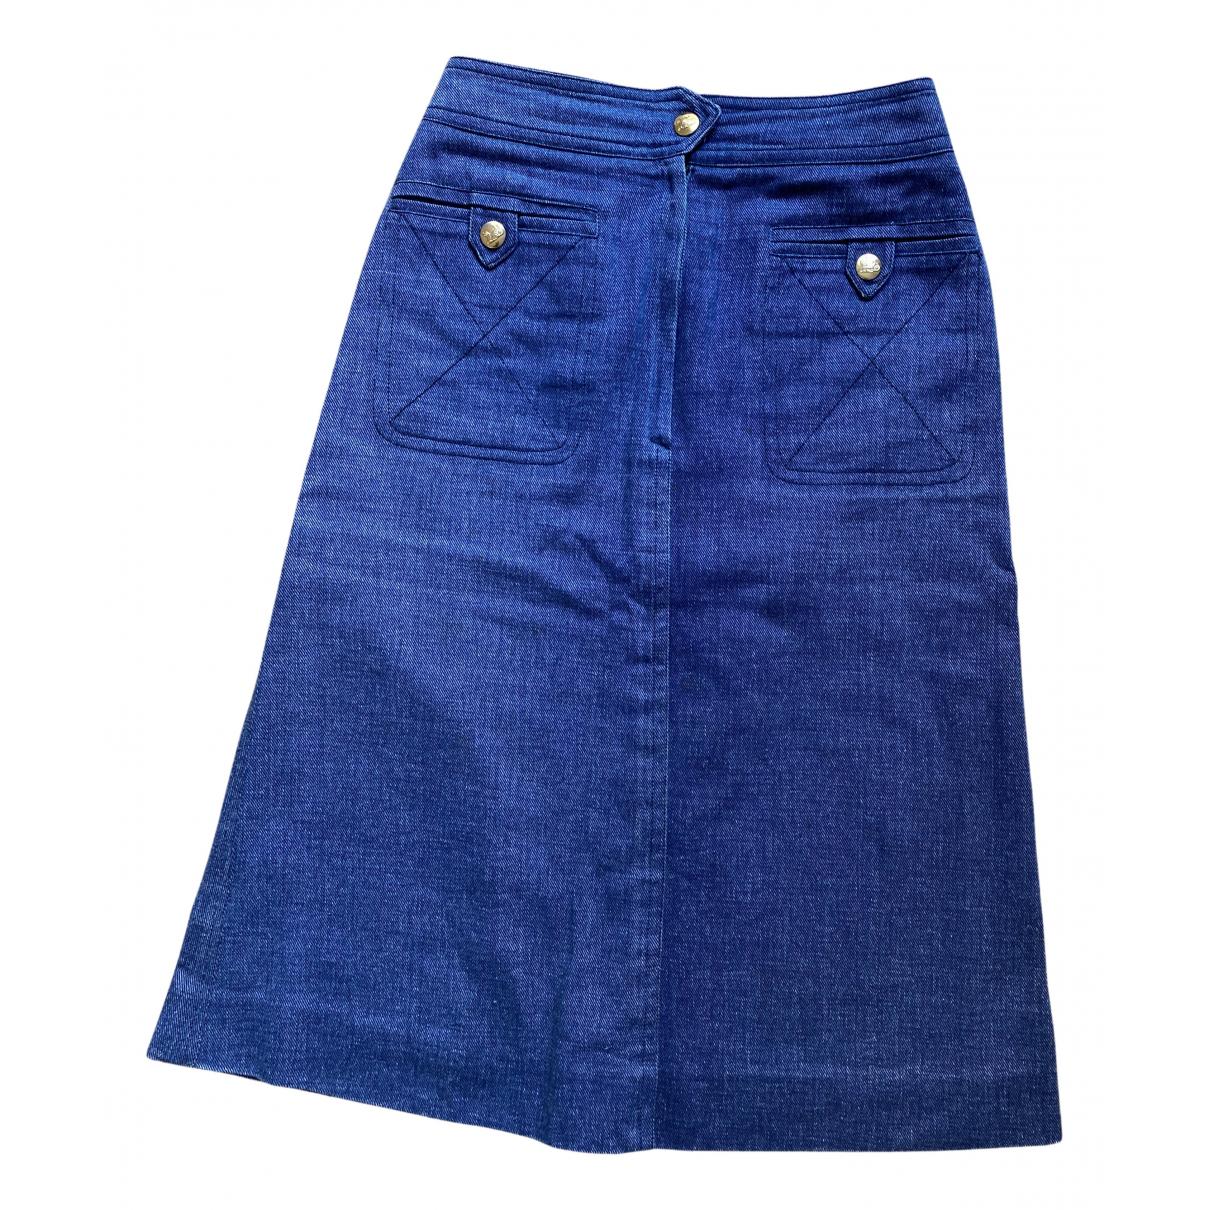 Celine - Jupe   pour femme en denim - bleu